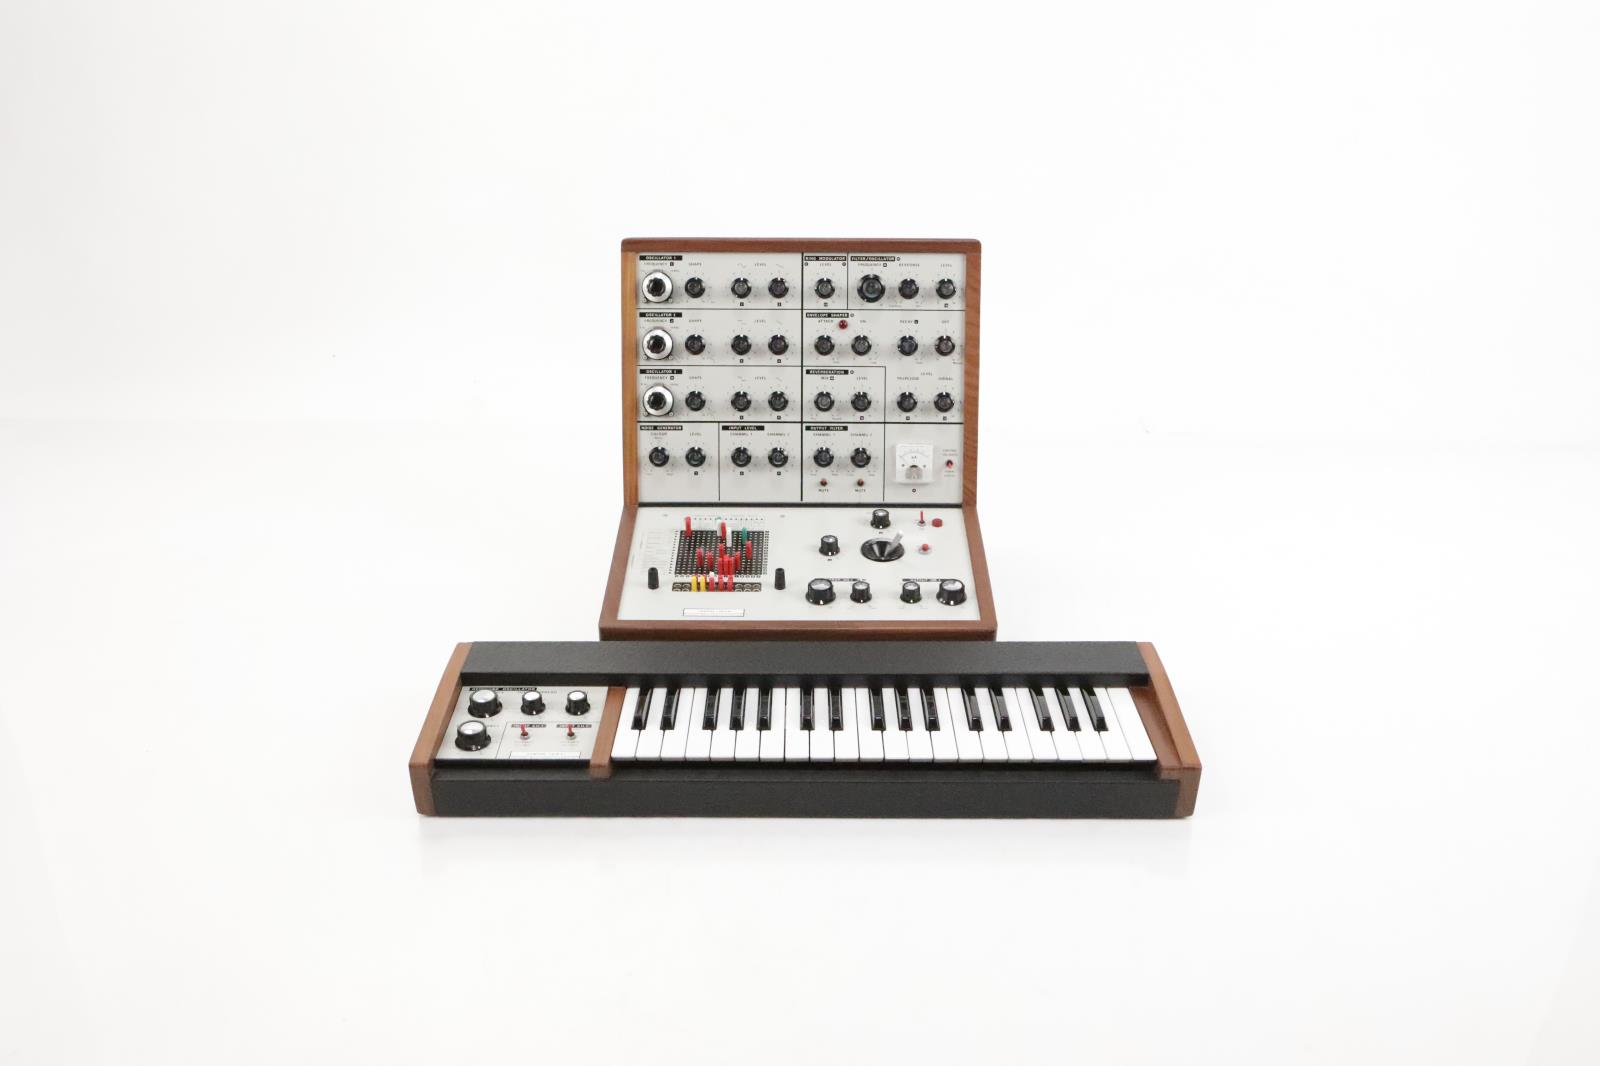 EMS Synthi VCS3 The Putney Synthesizer w/ DK1 Keyboard #34323 | eBay